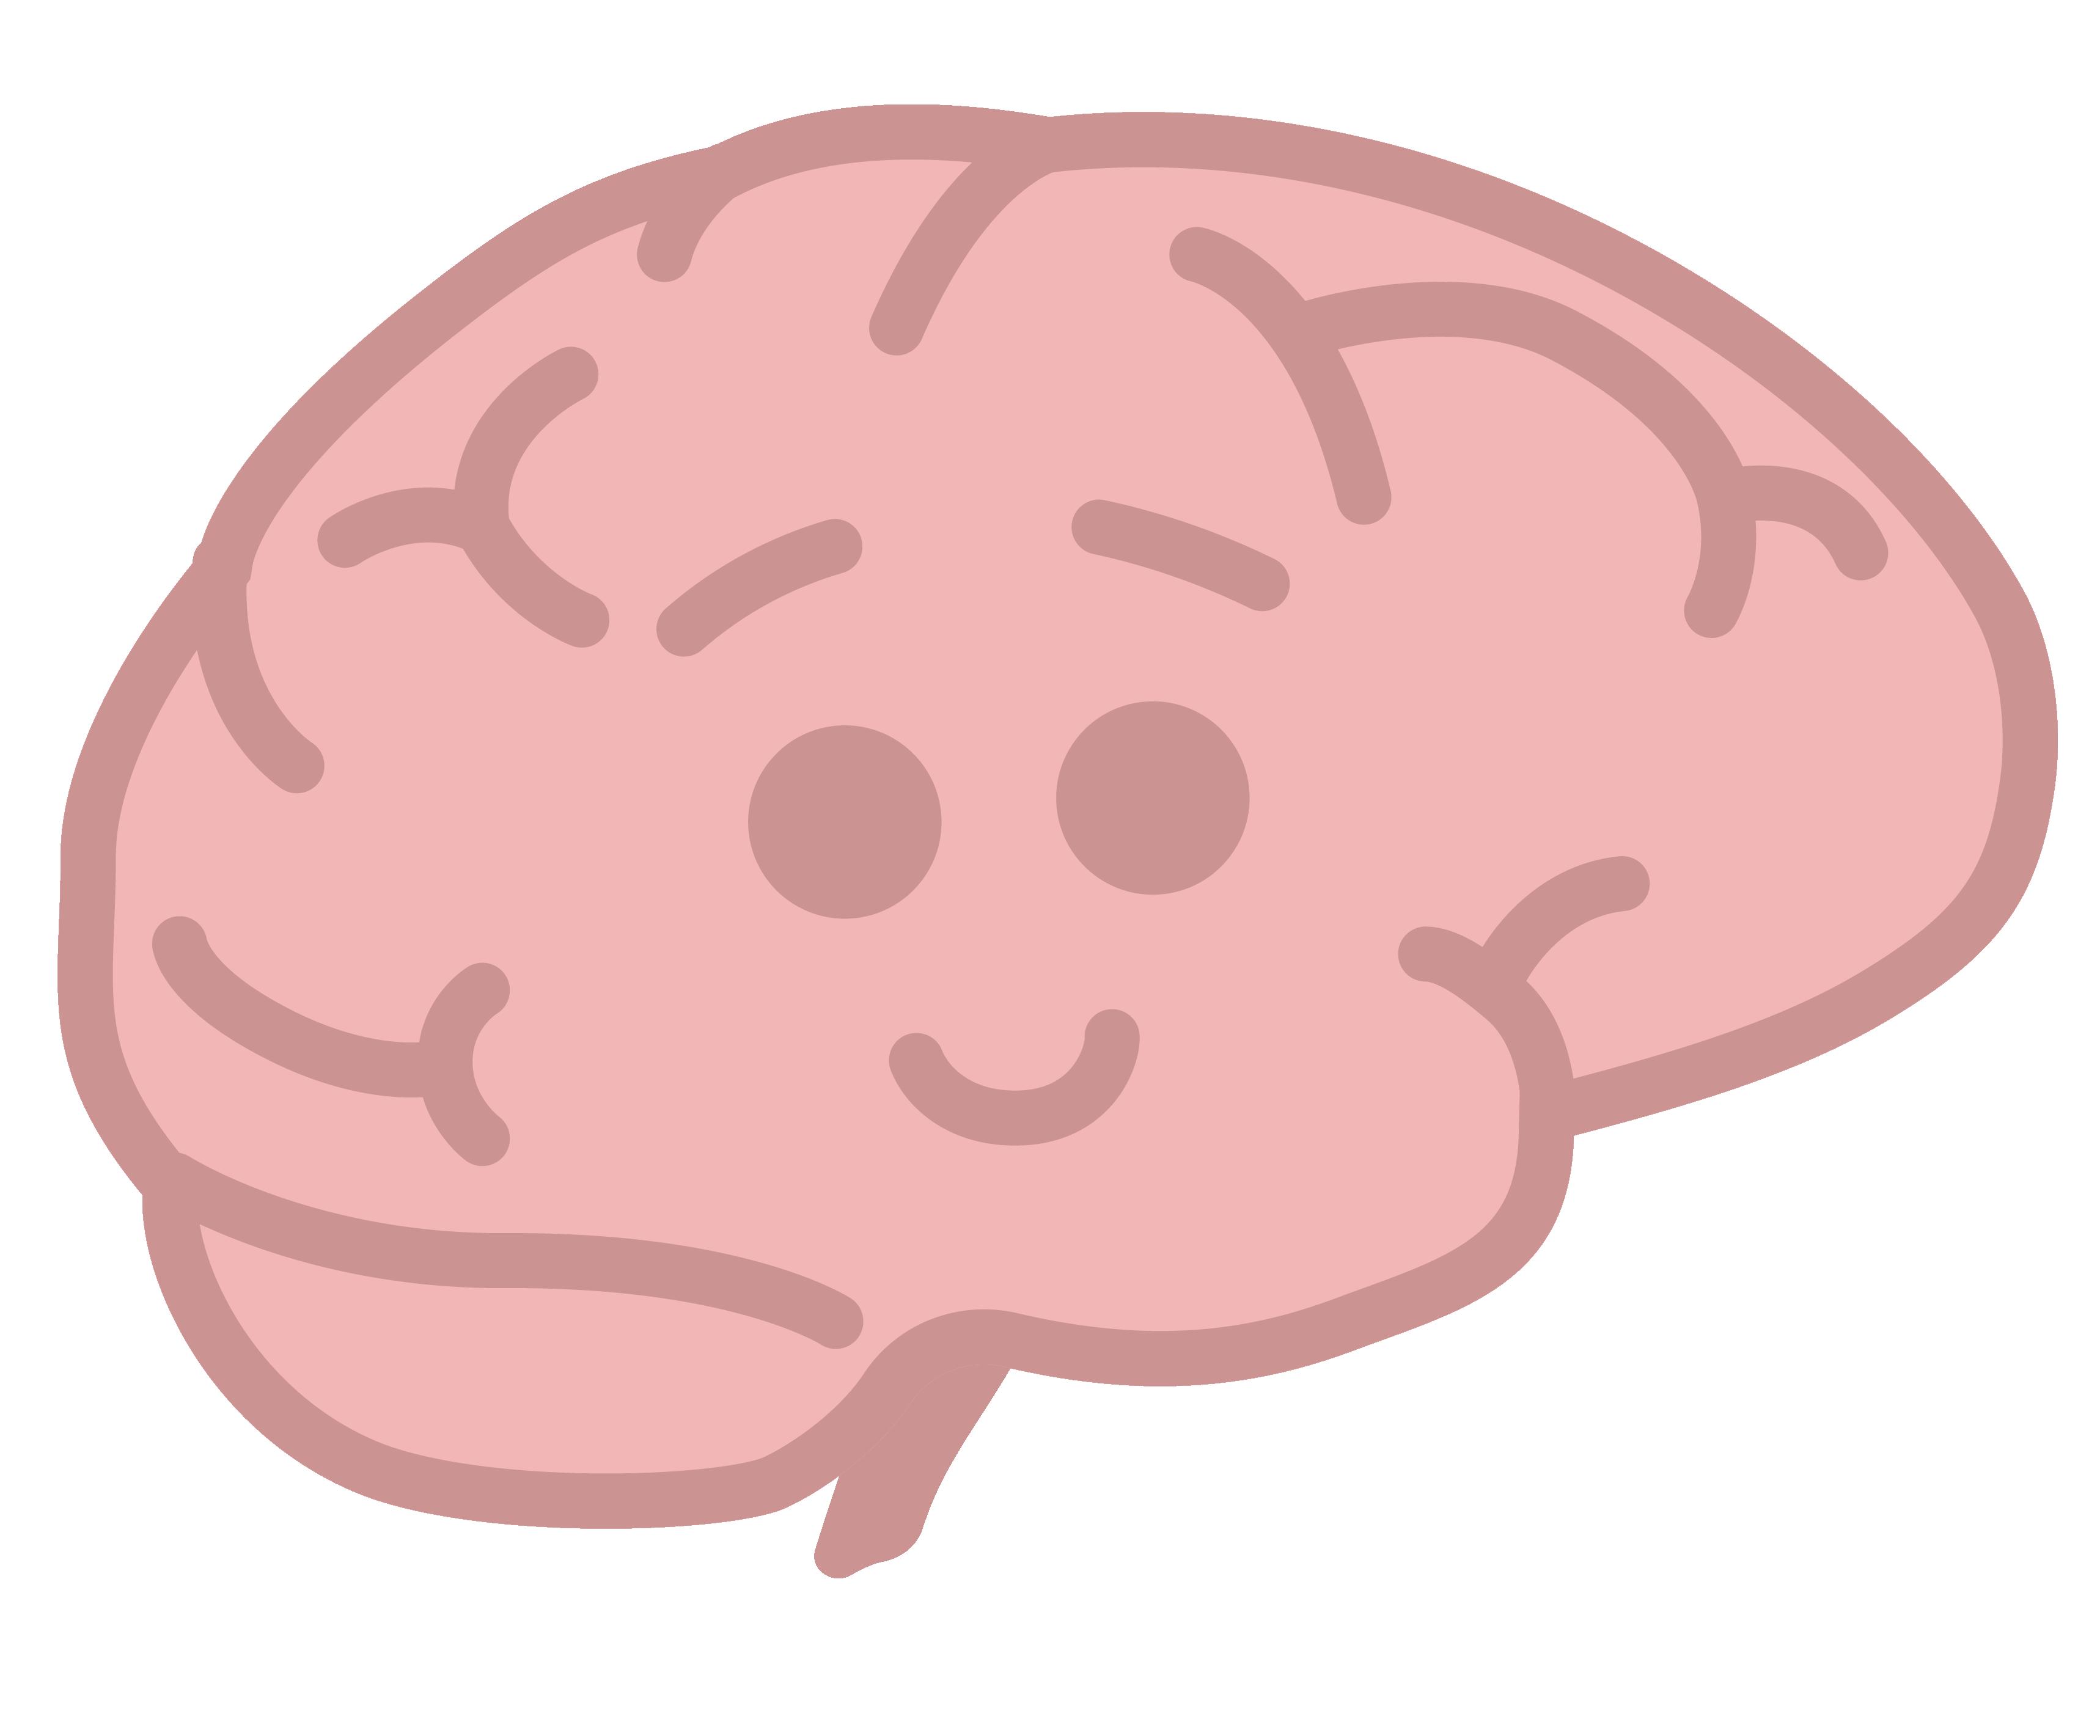 Illustration - Happy smiling brain